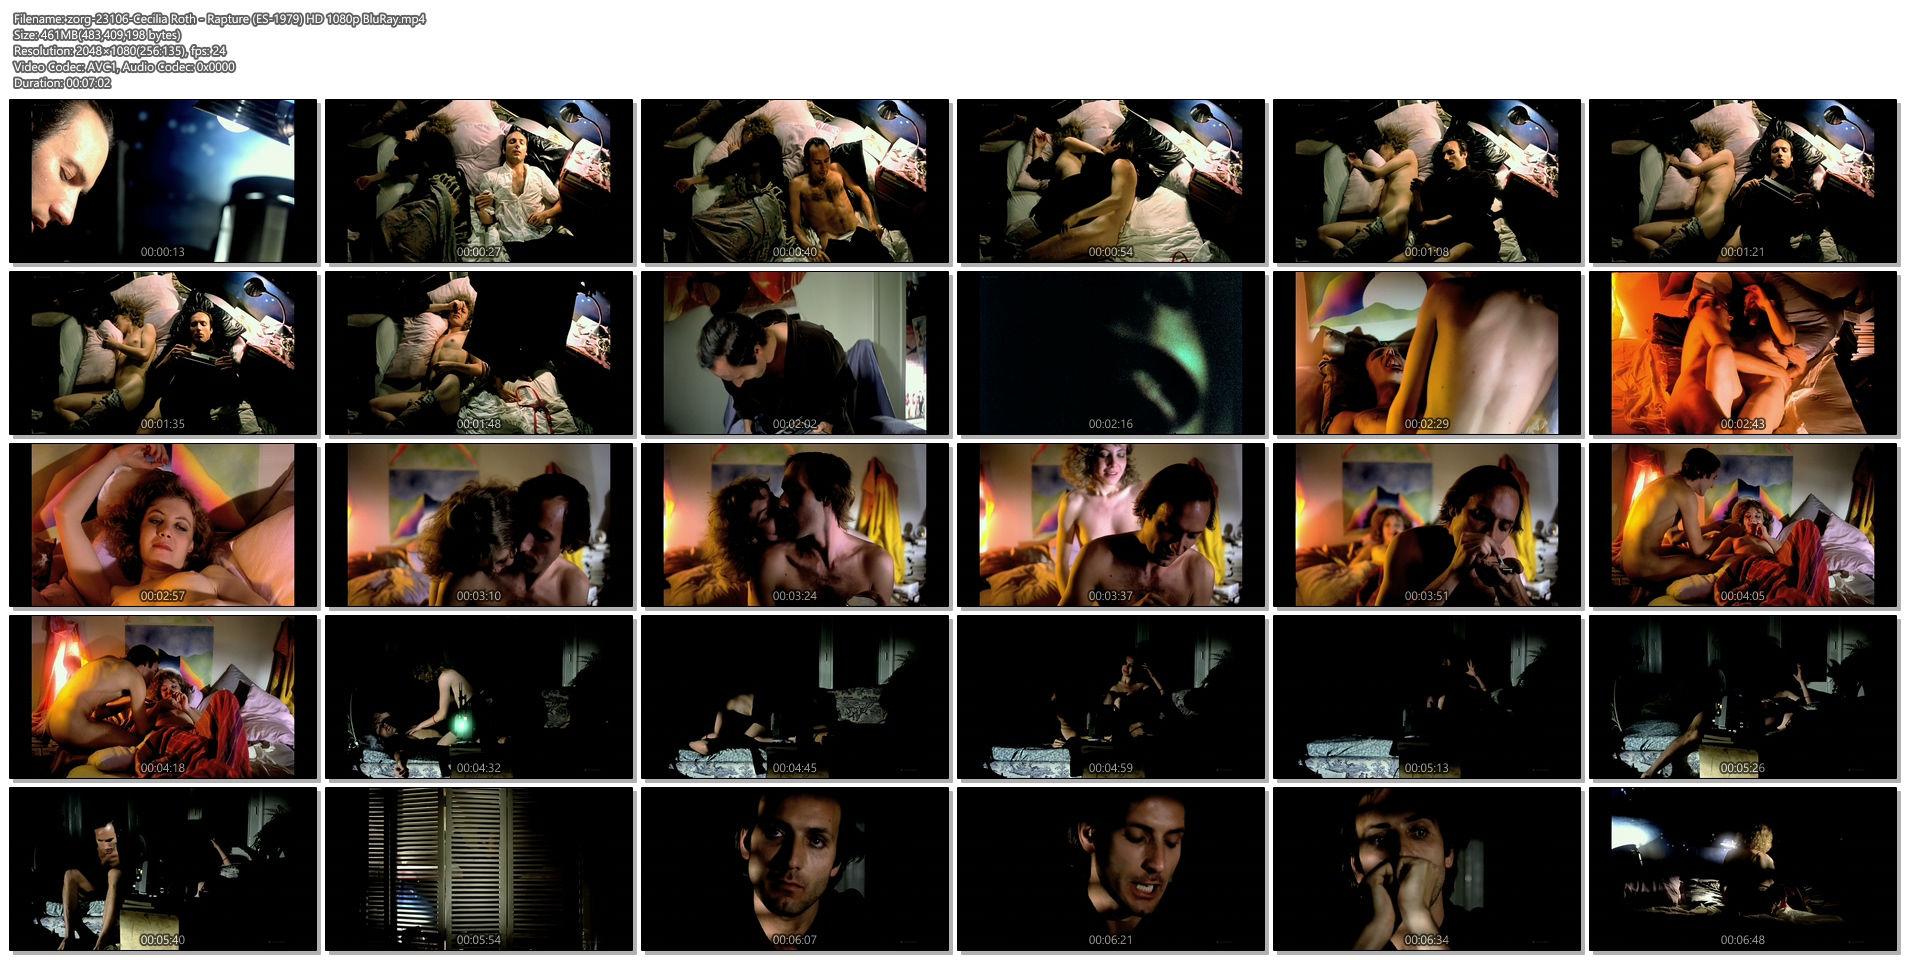 Cecilia Roth nude and sex - Rapture (ES-1979) HD 1080p BluRay (1)